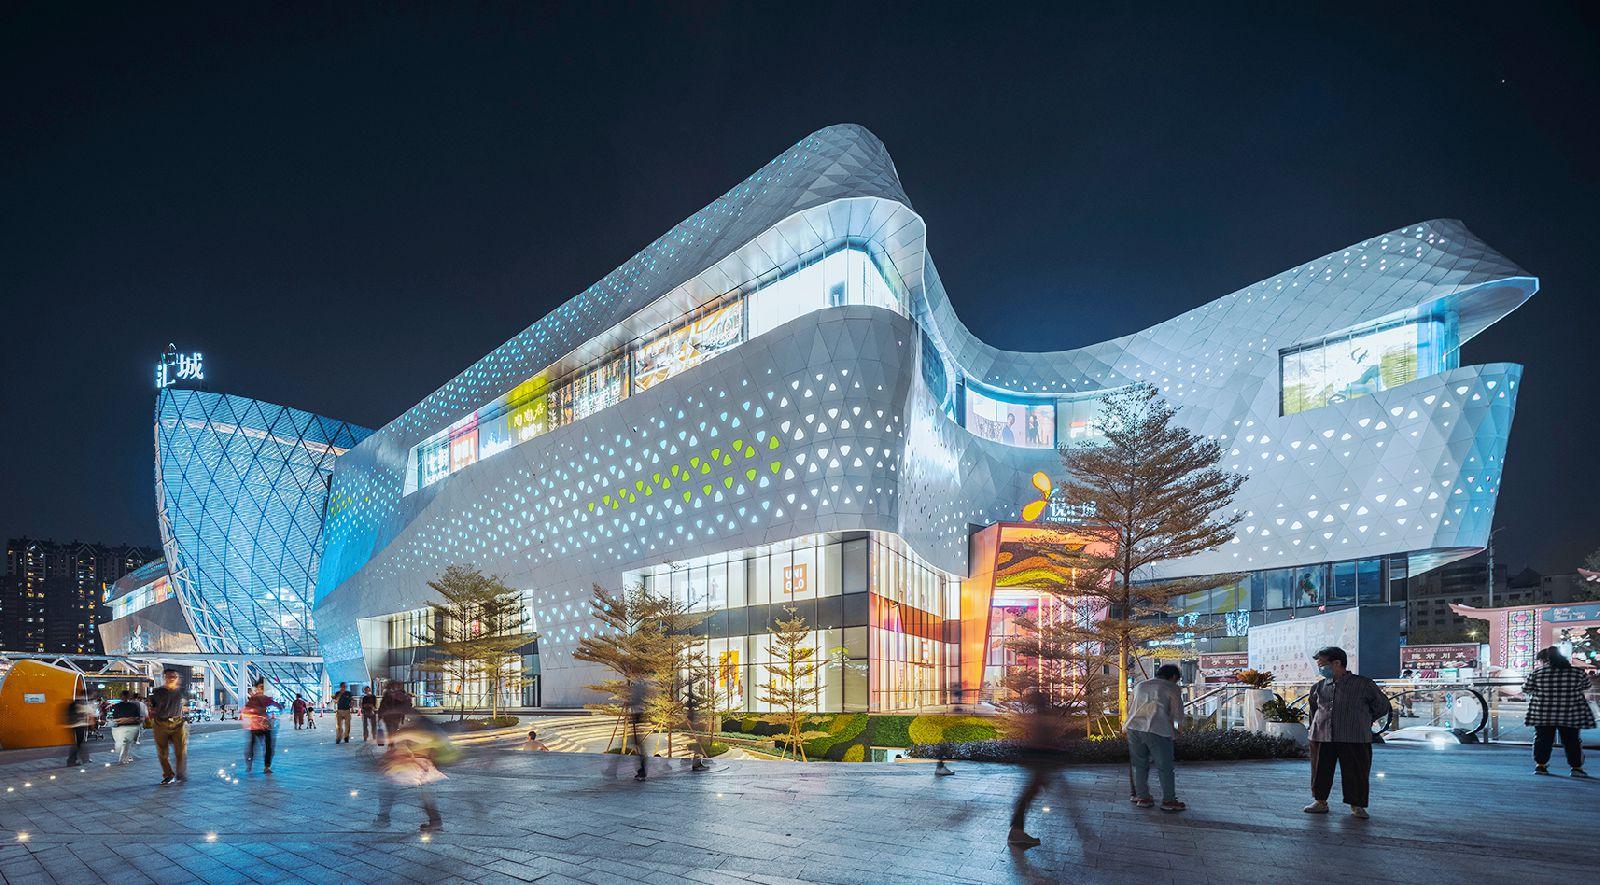 Yue City